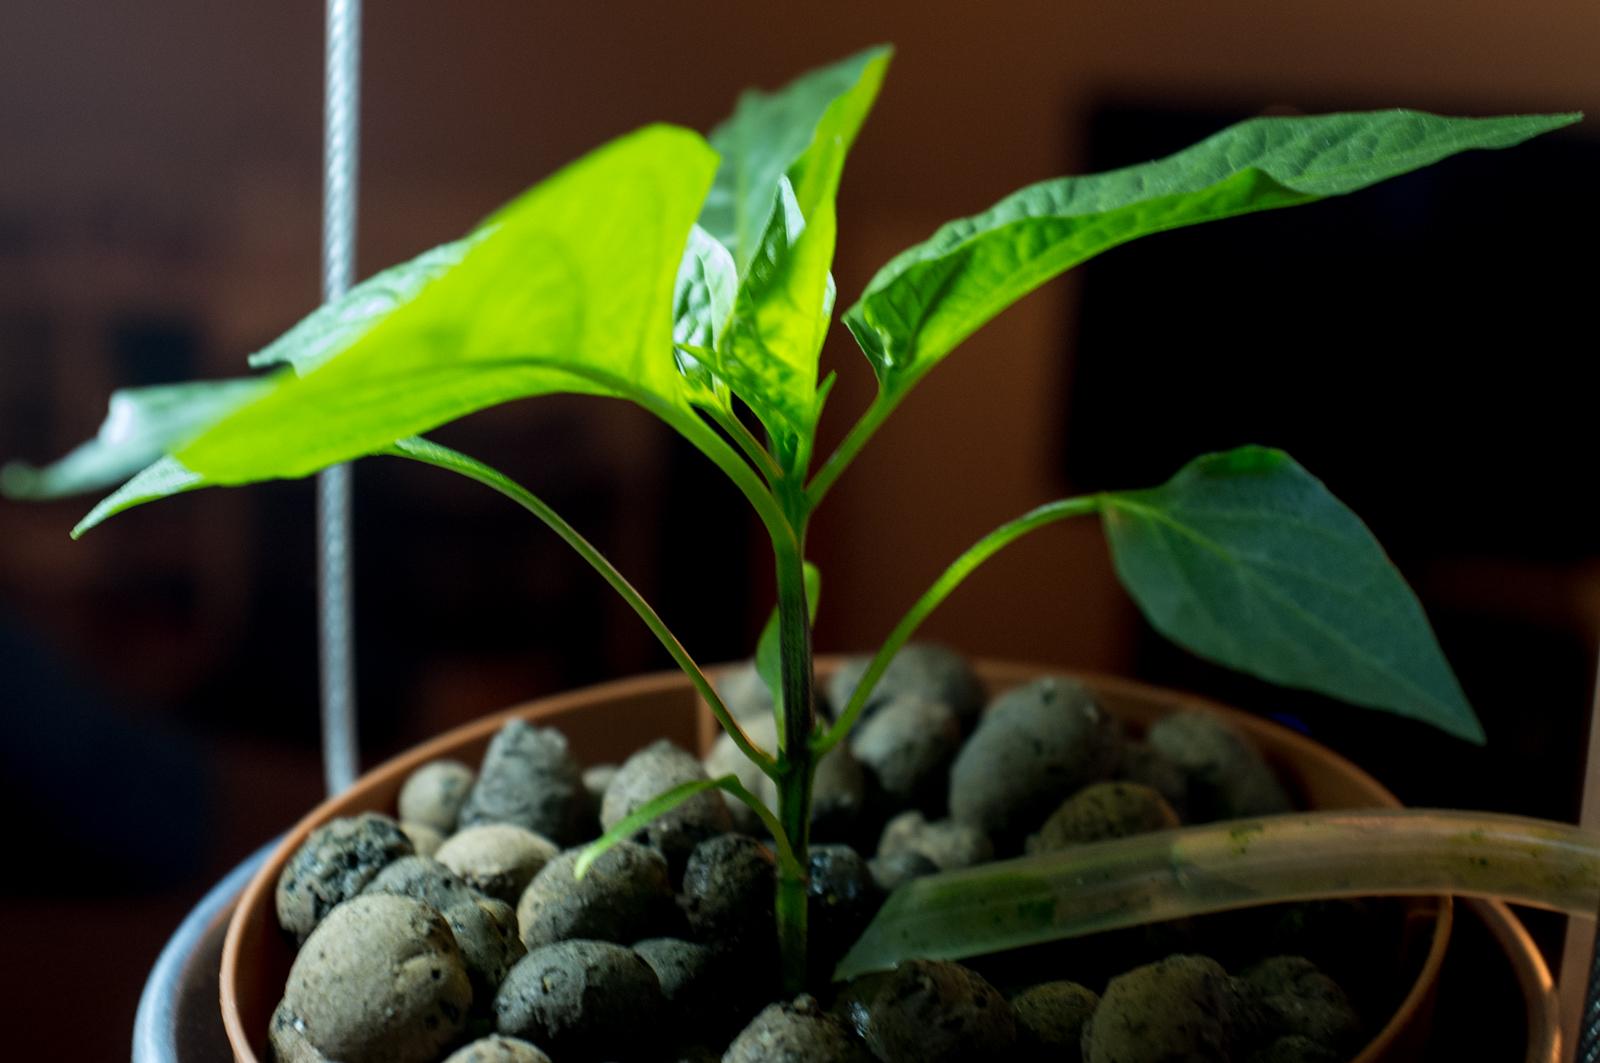 Plant (pepper)